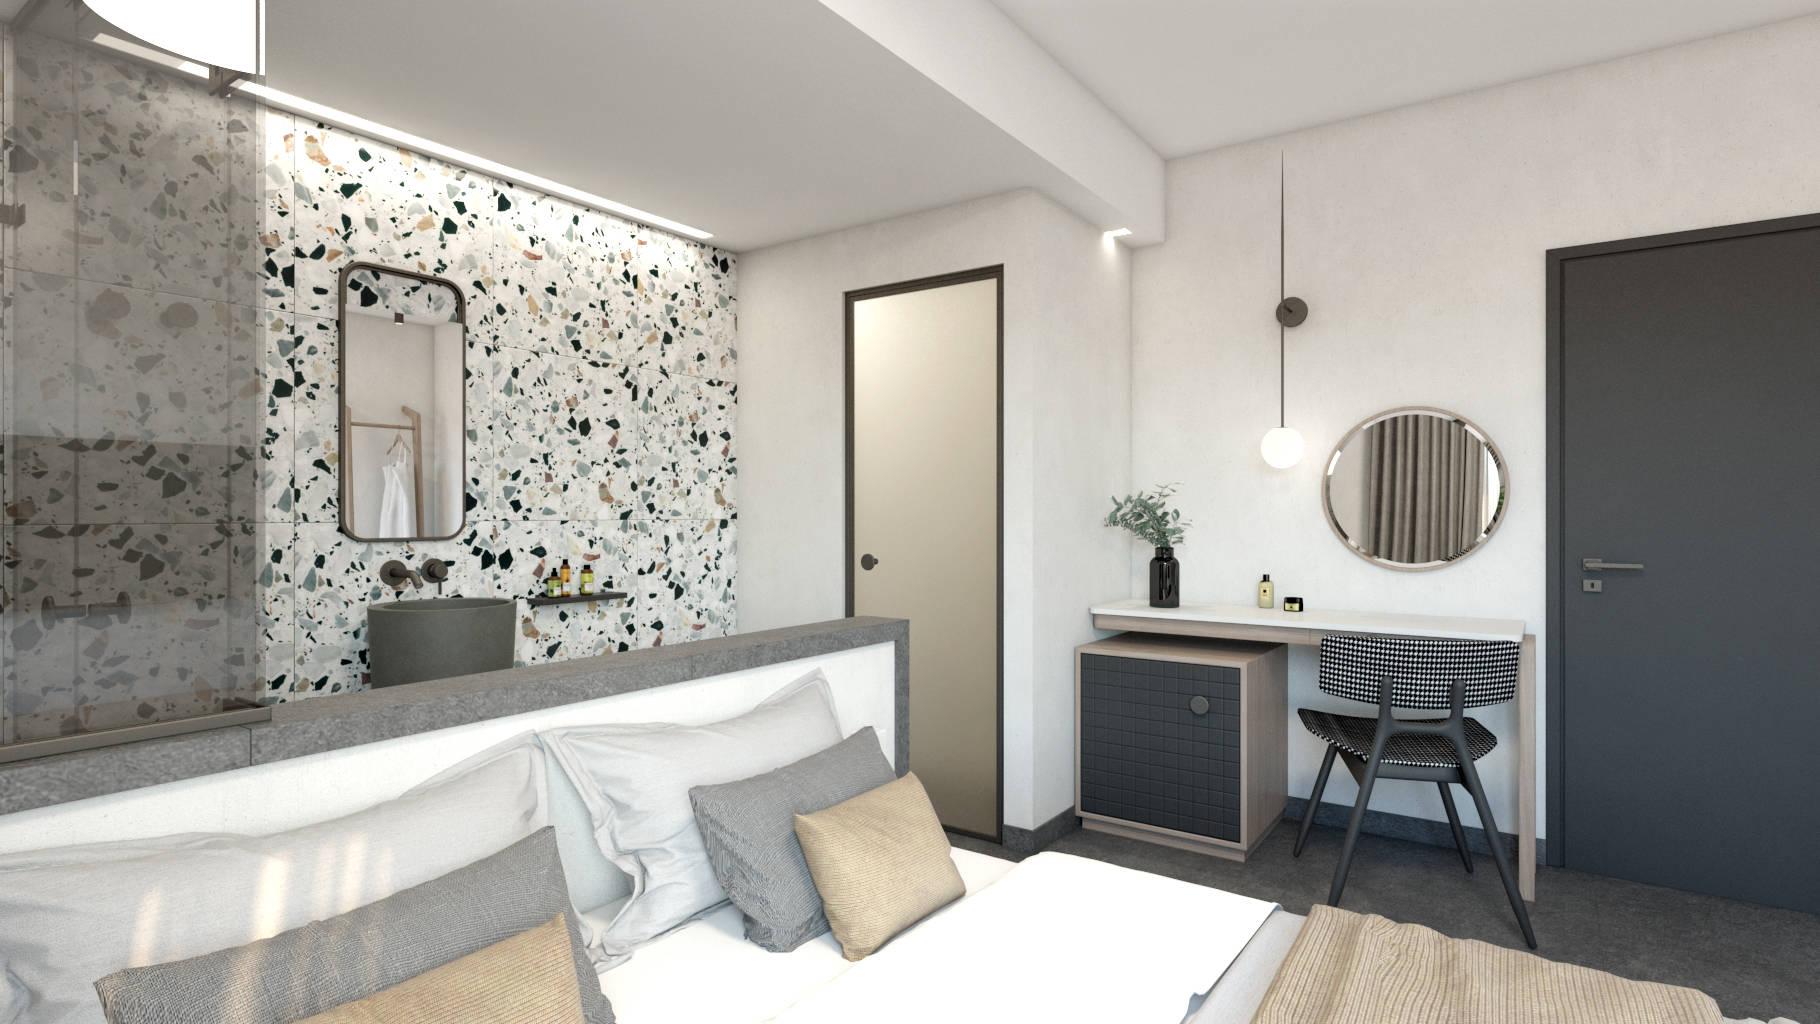 Double hotel room, interior design, bed, open bathroom and dressing table. Δίκλινο δωμάτιο ξενοδοχείου, κρεβάτι και ανοιχτό μπάνιο και γραφείο.